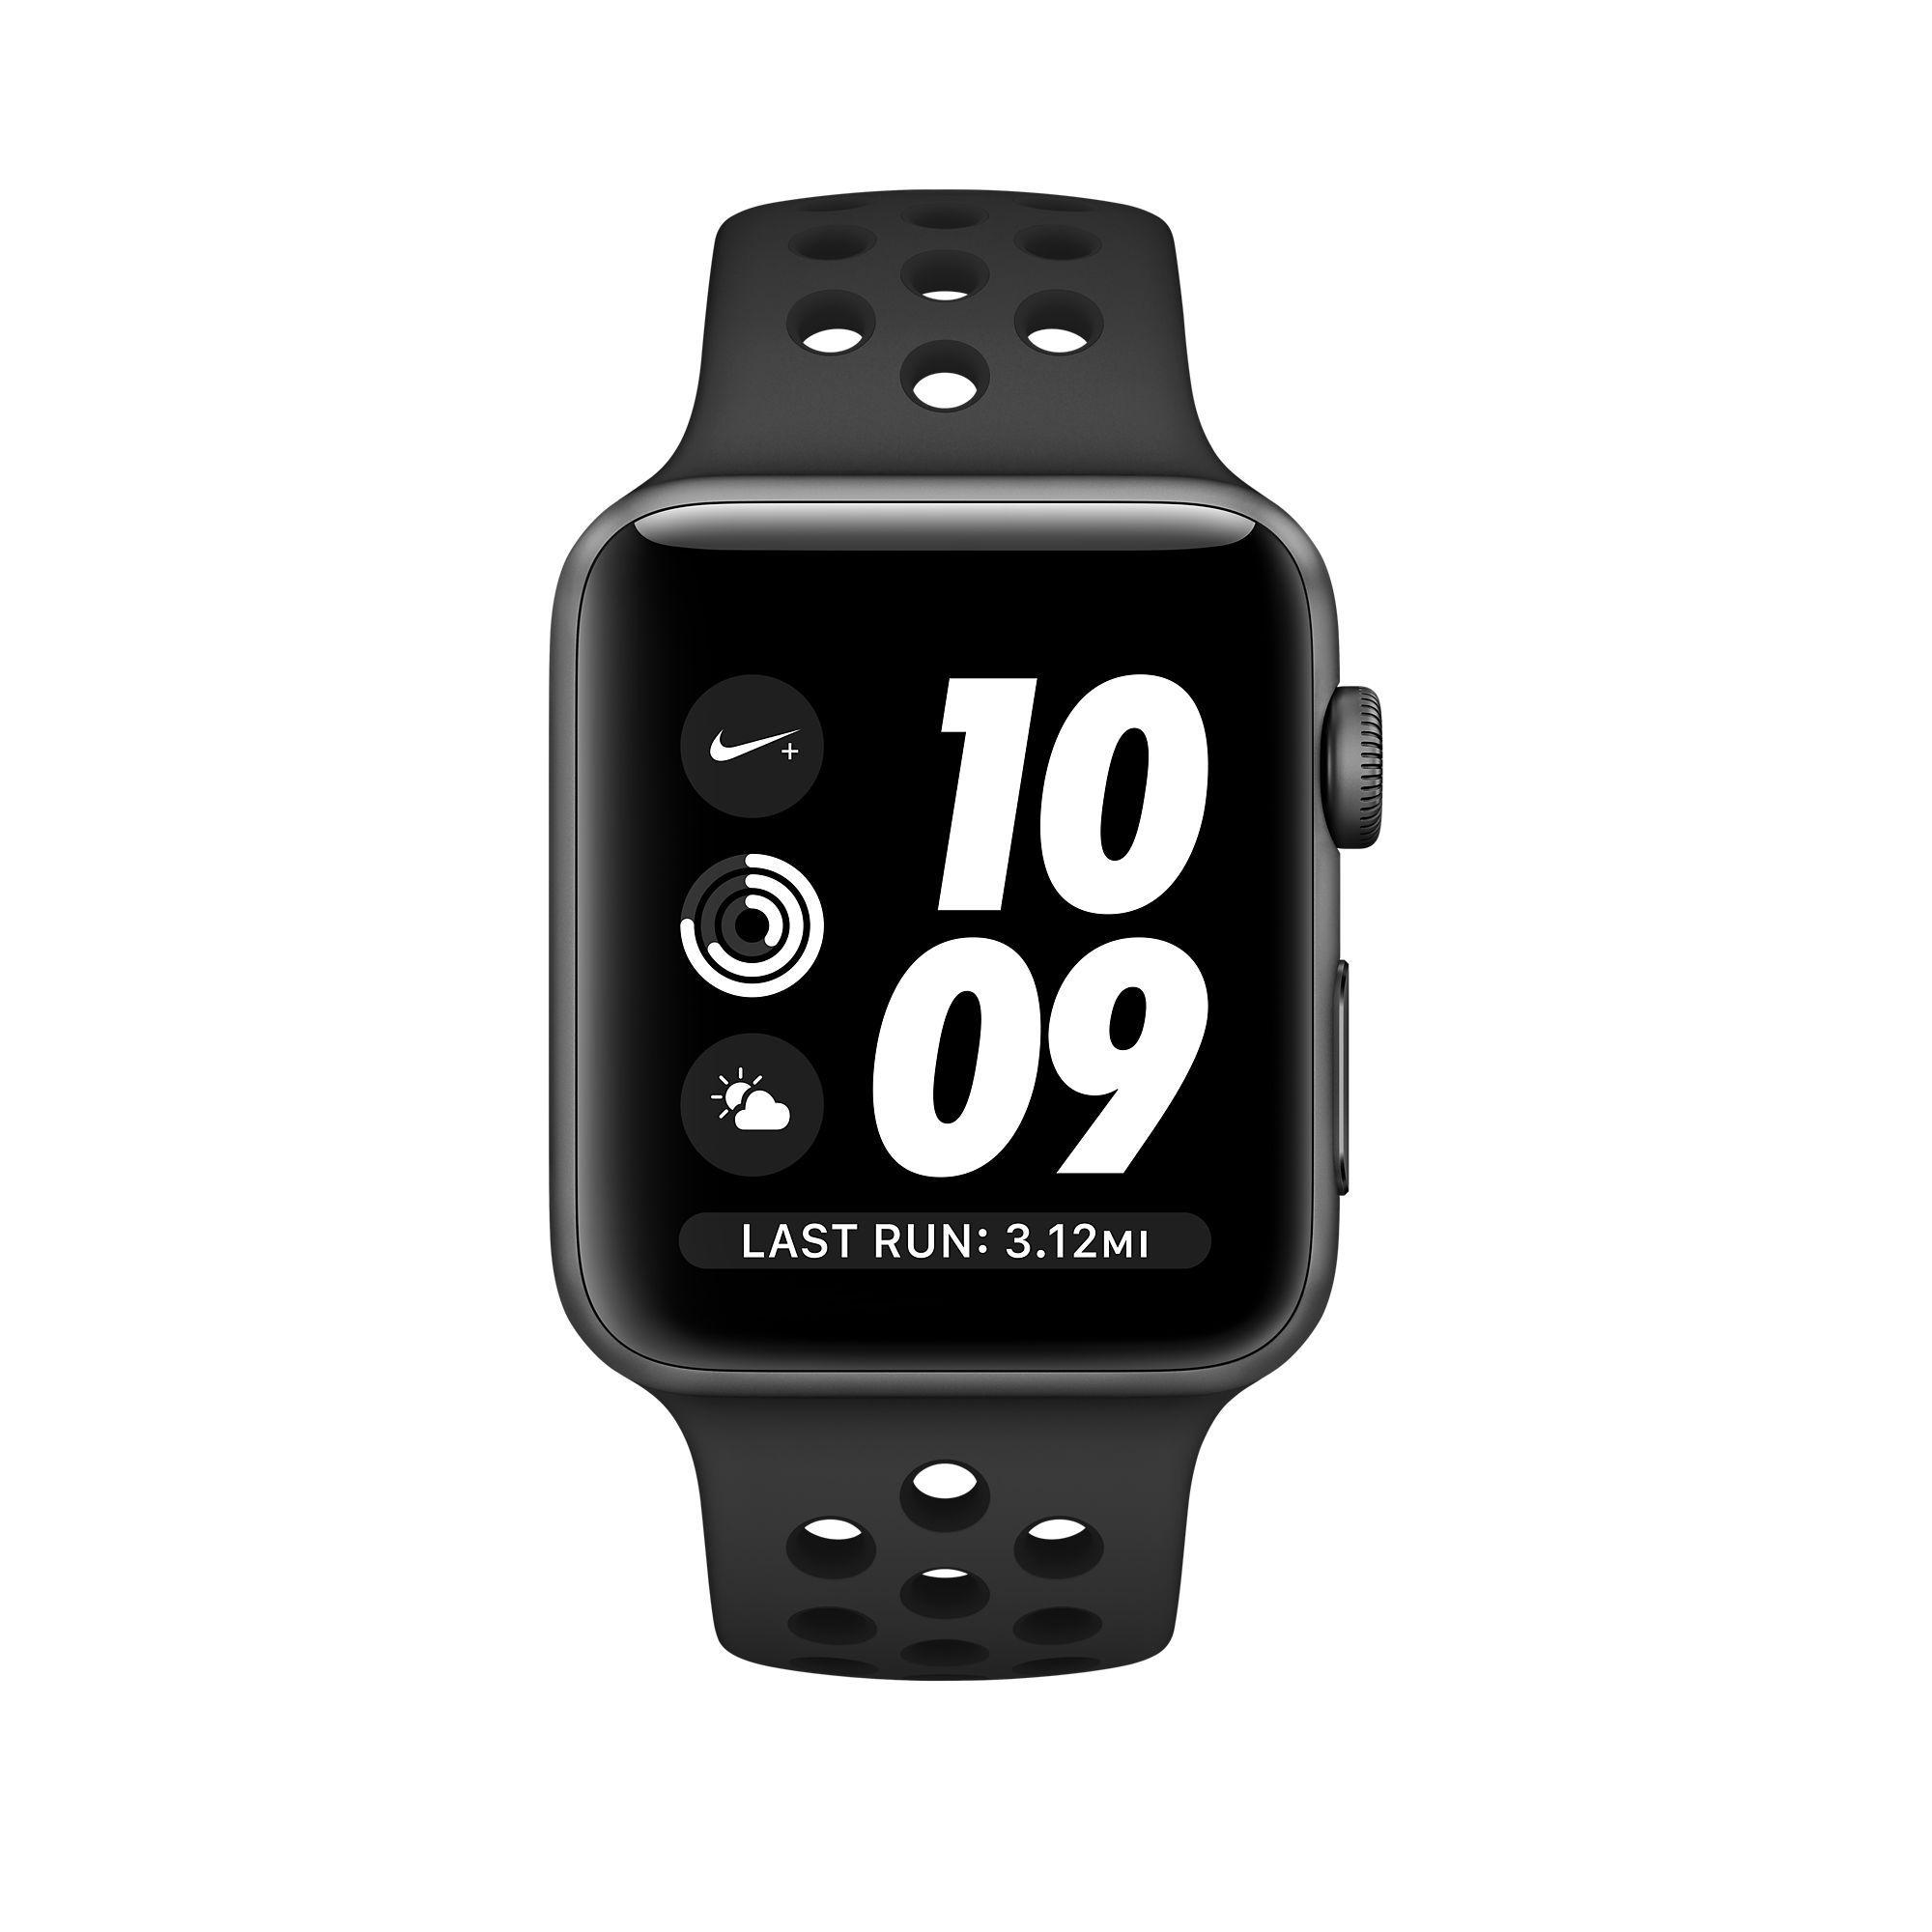 Buy Apple Watch Nike Apple Watch Nike Apple Watch New Apple Watch